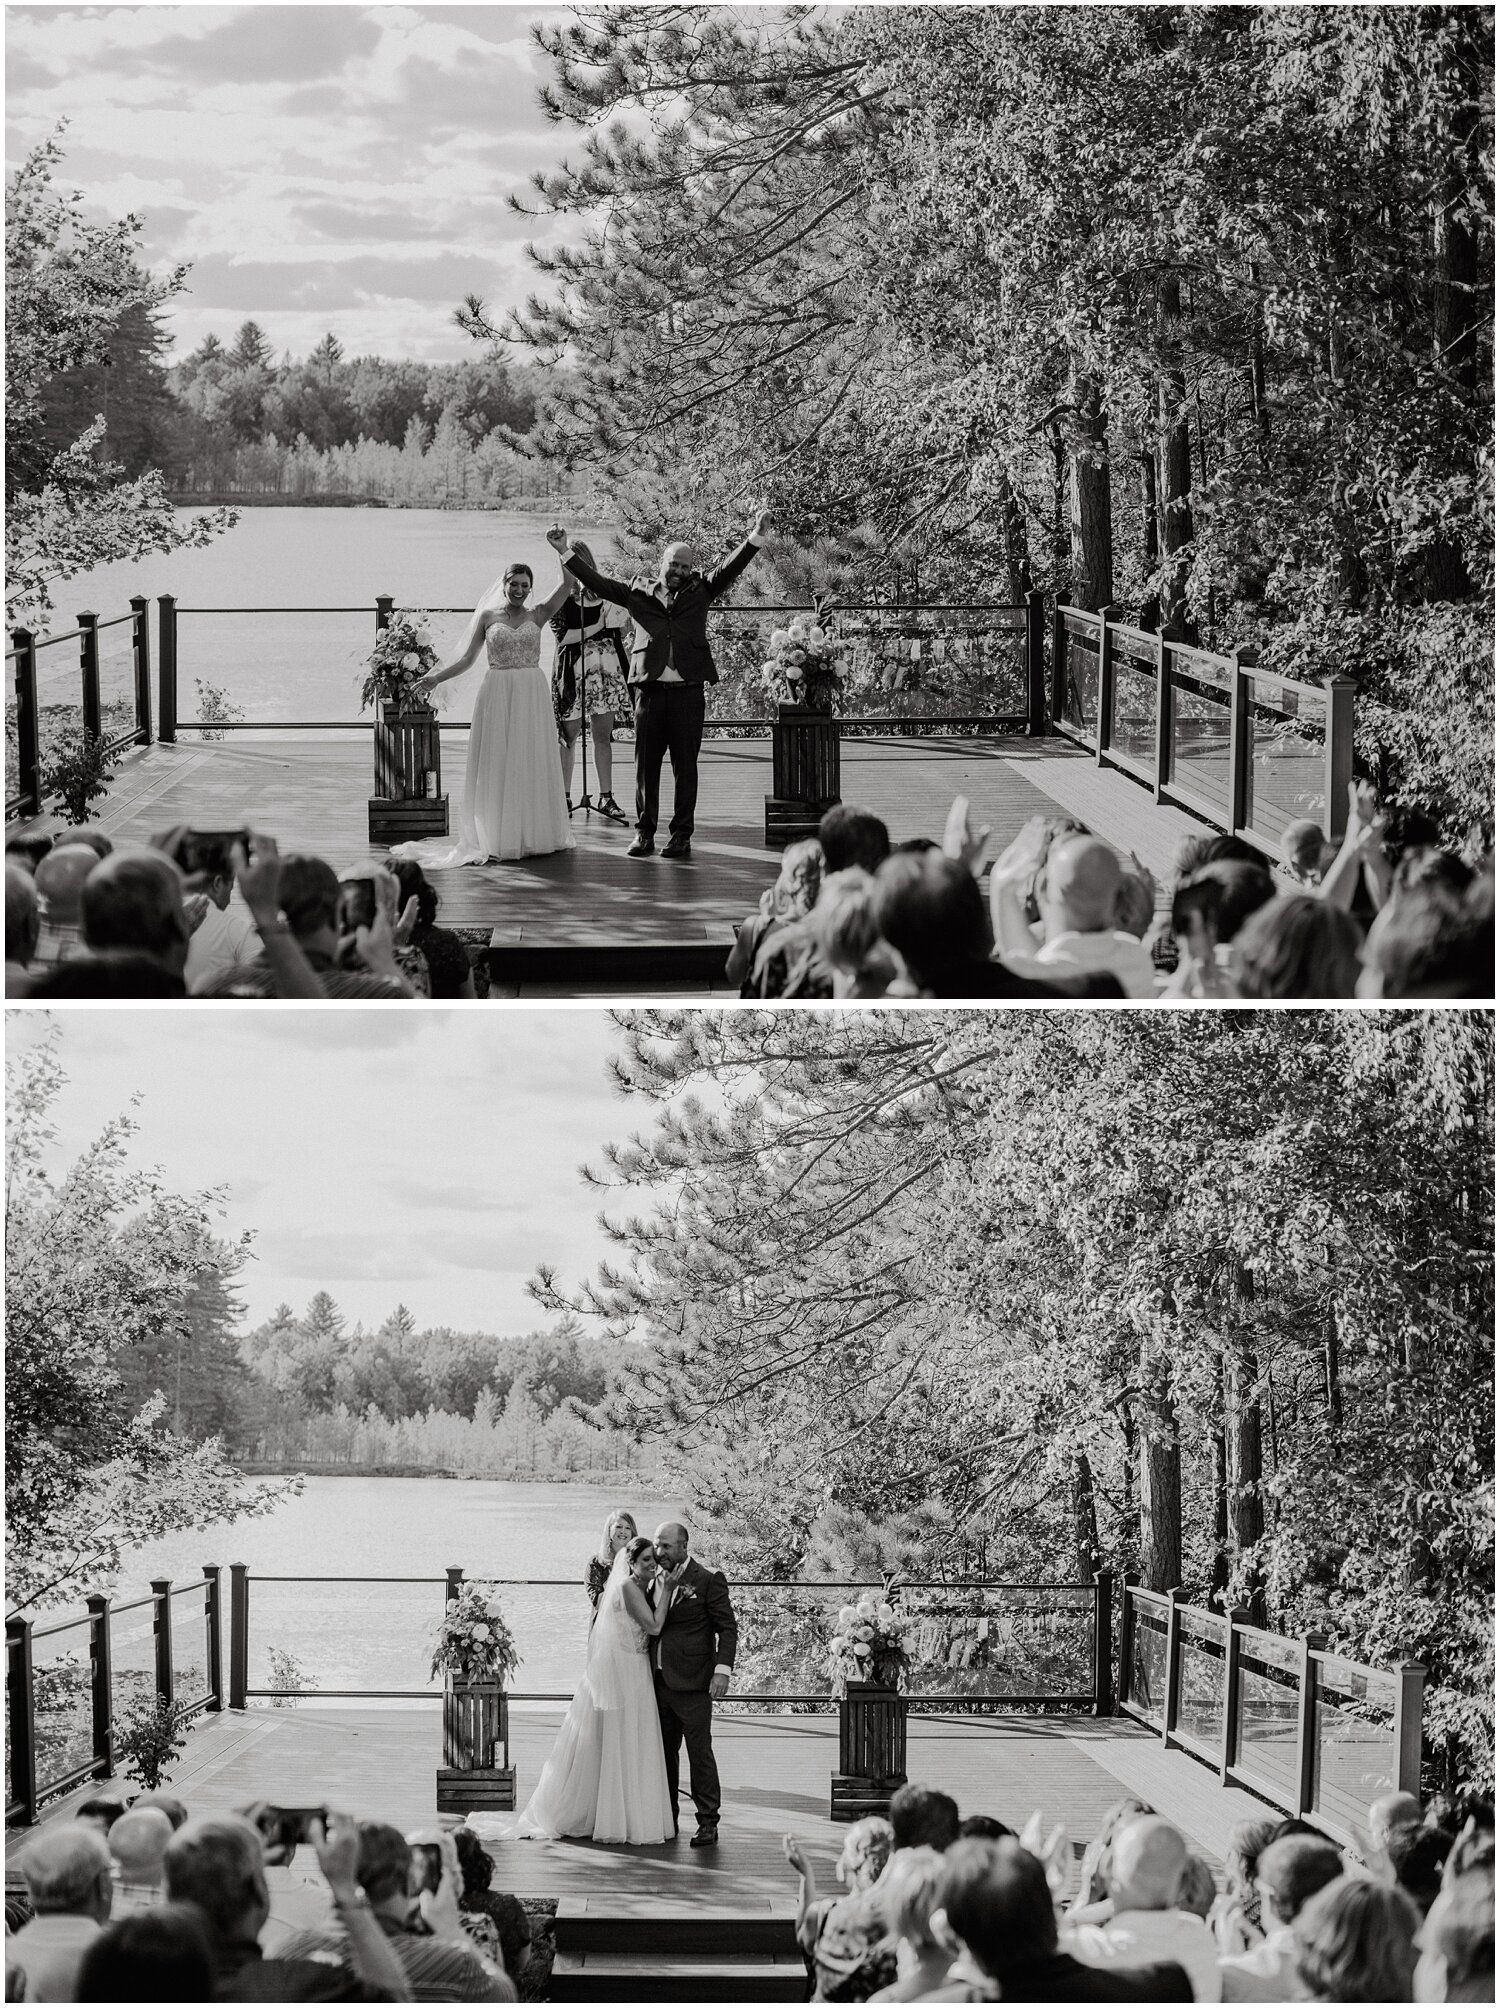 manitowish-waters-wedding_0057.jpg